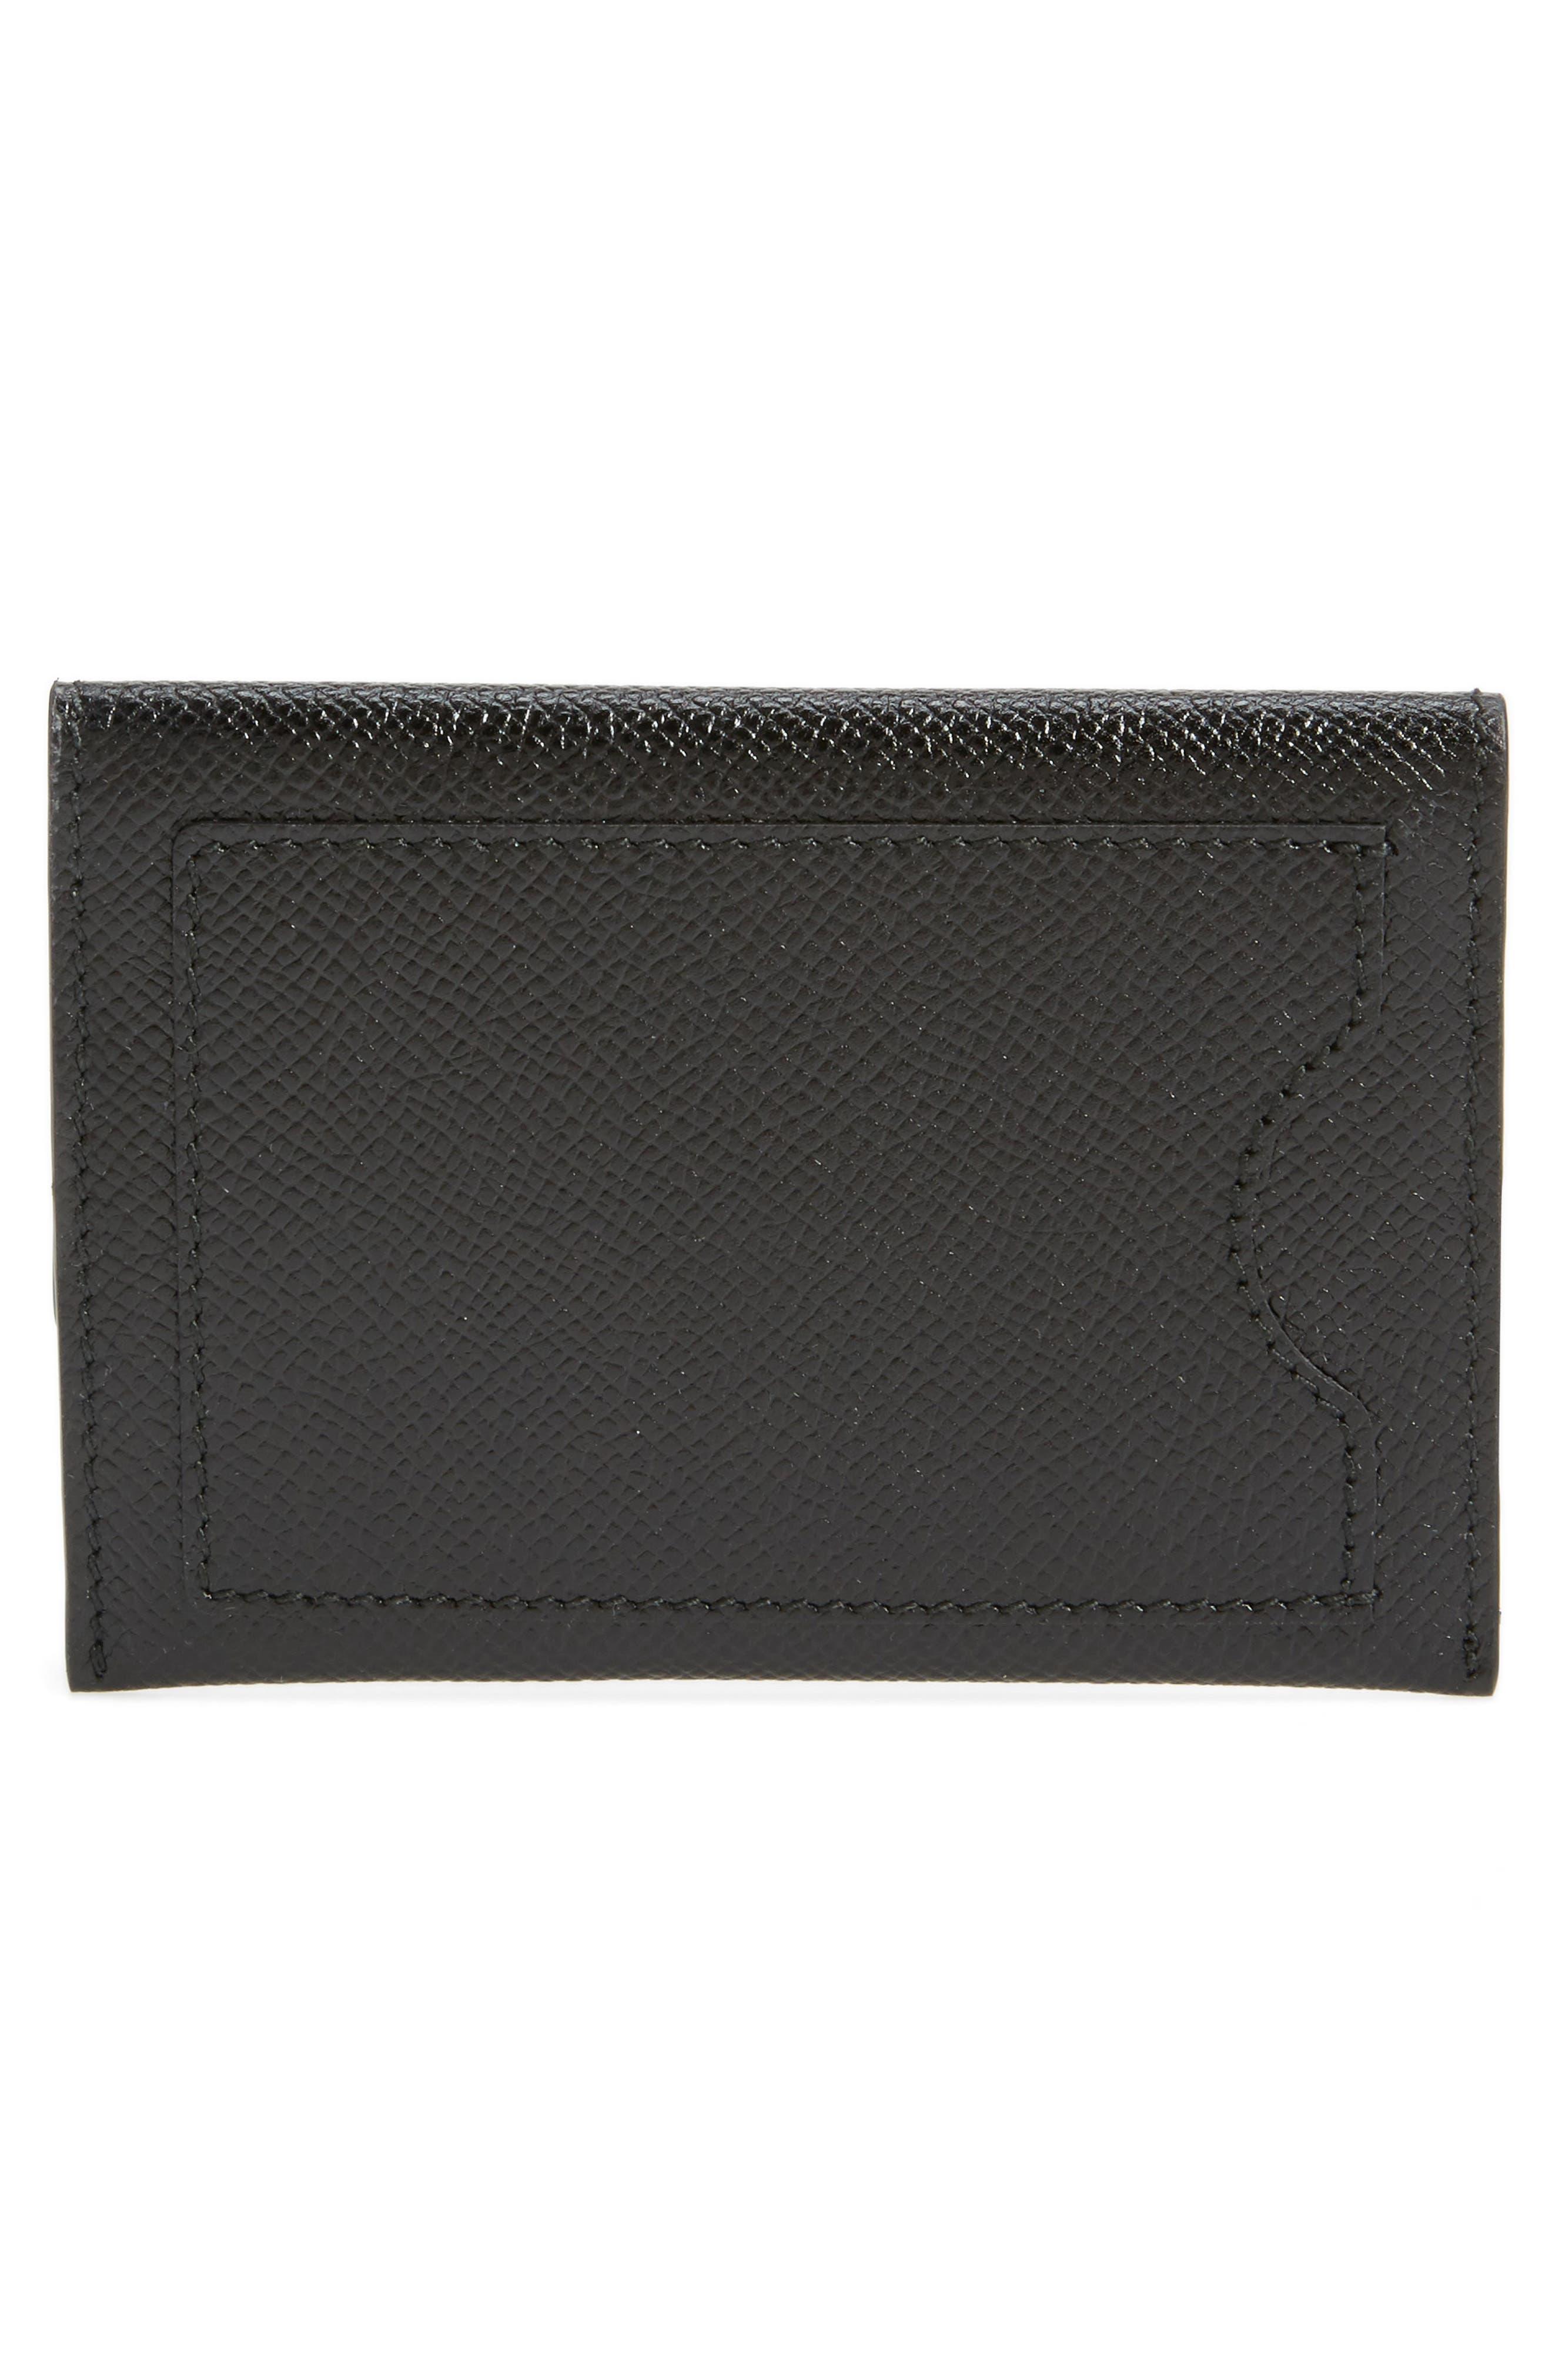 Vara Leather Card Case,                             Alternate thumbnail 2, color,                             070